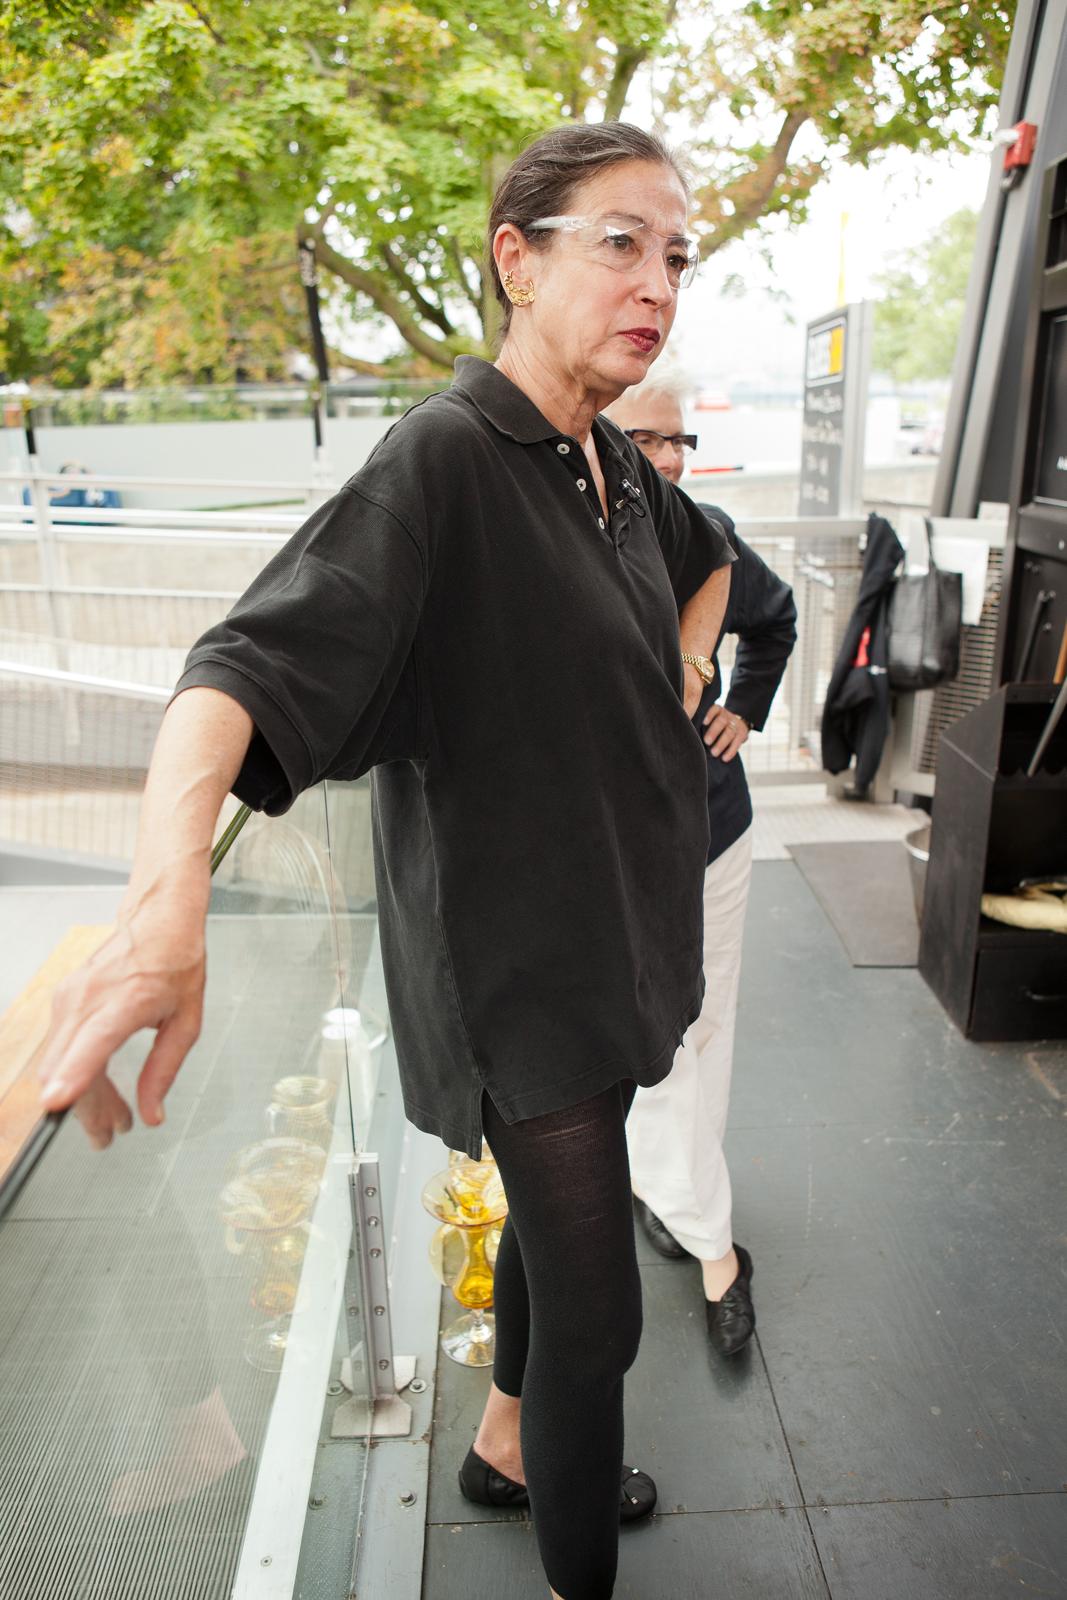 Designer Michele Oka Doner at GlassLab in Corning, August 2012